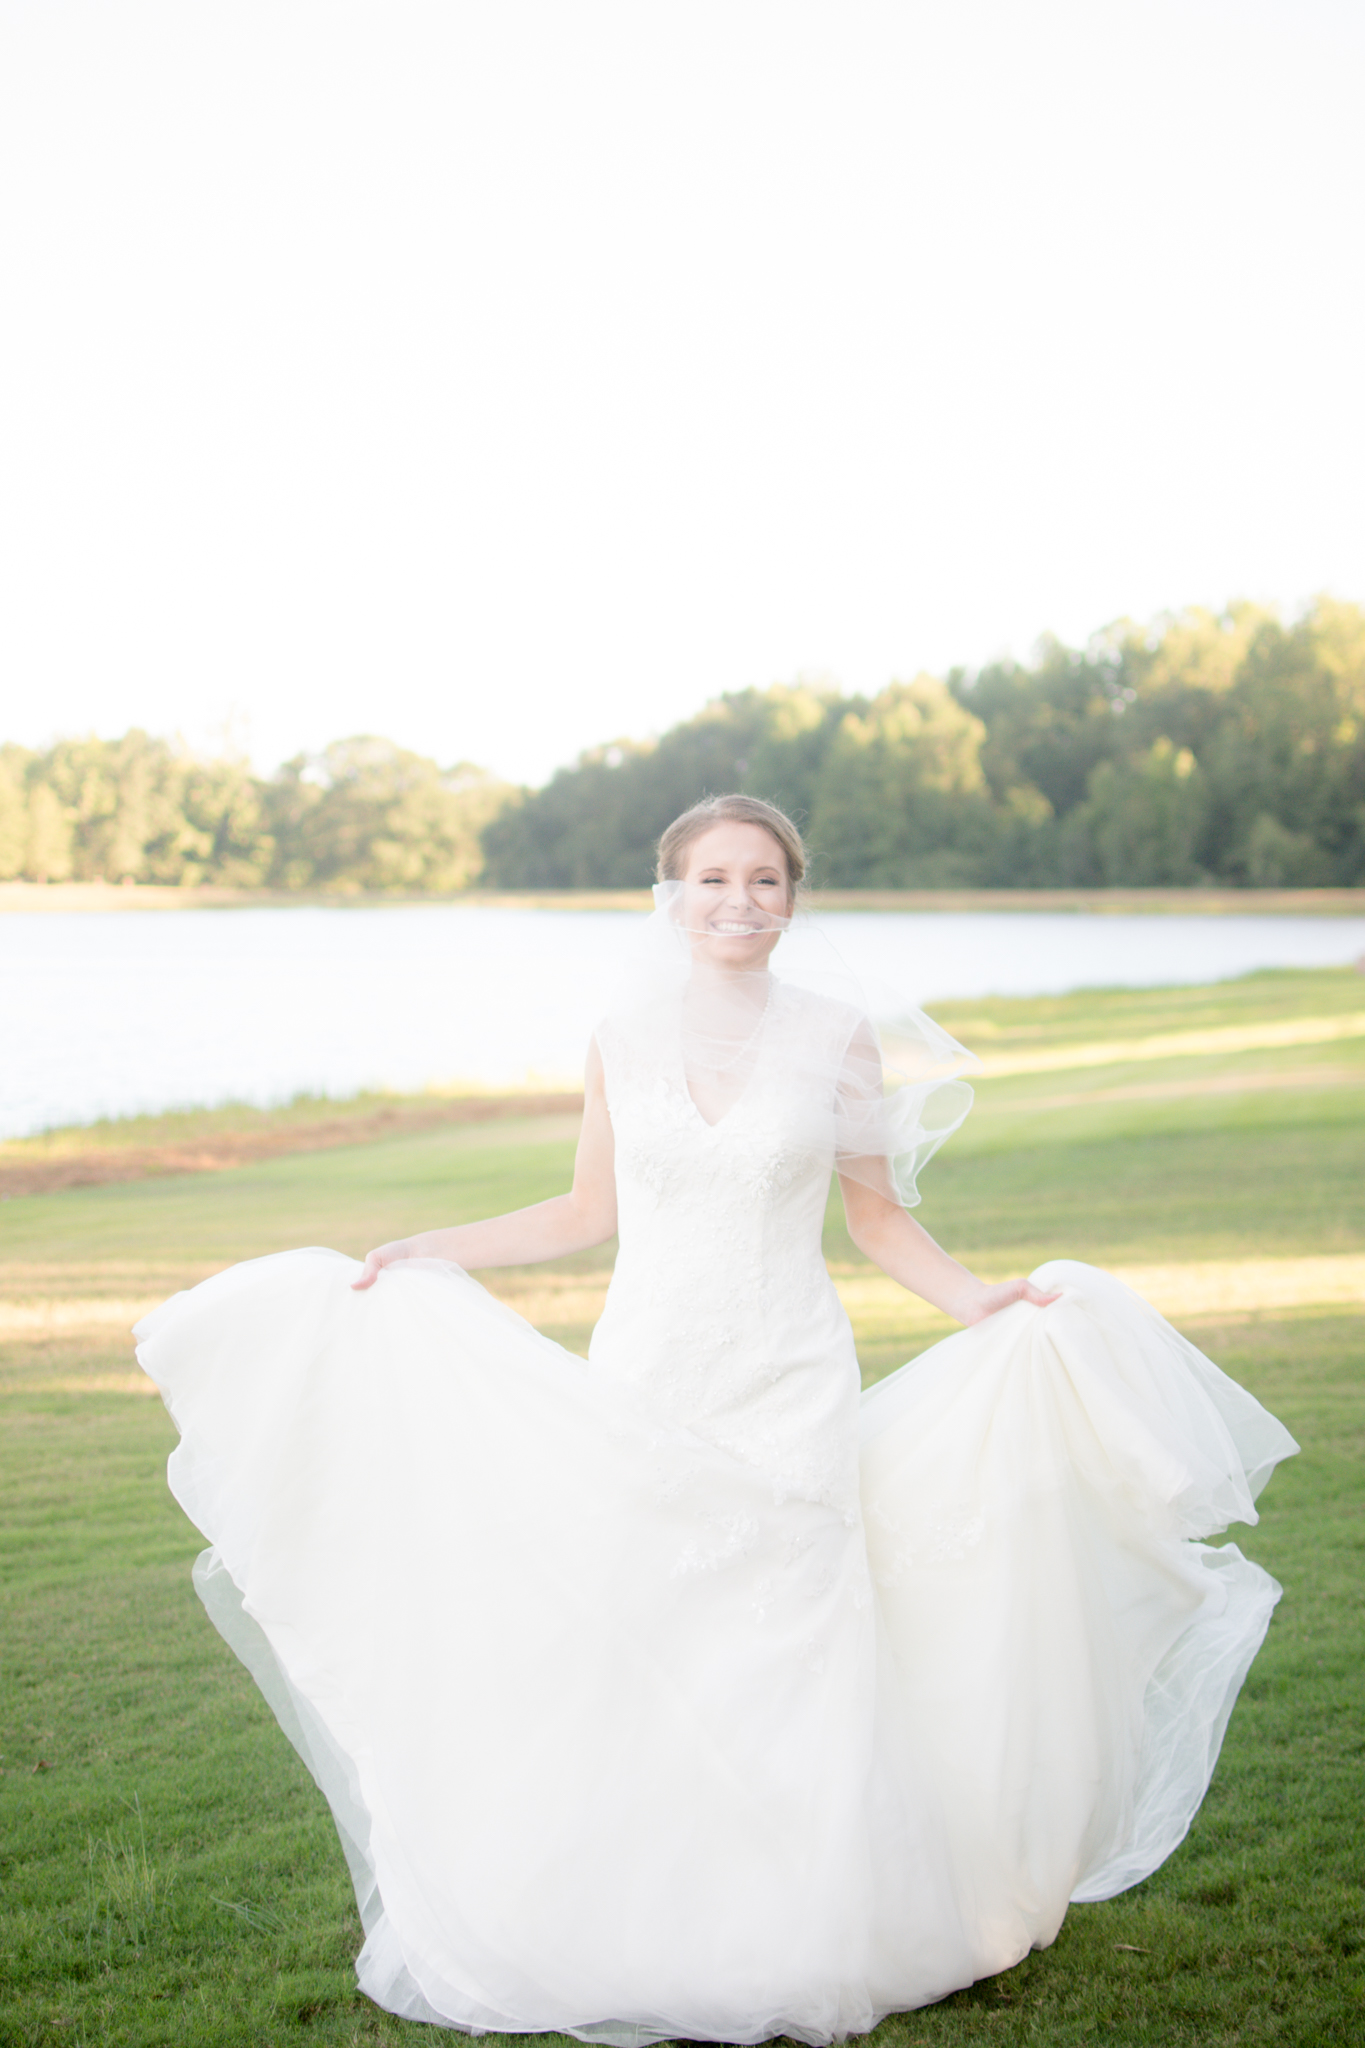 bridalportraits (15 of 49).JPG